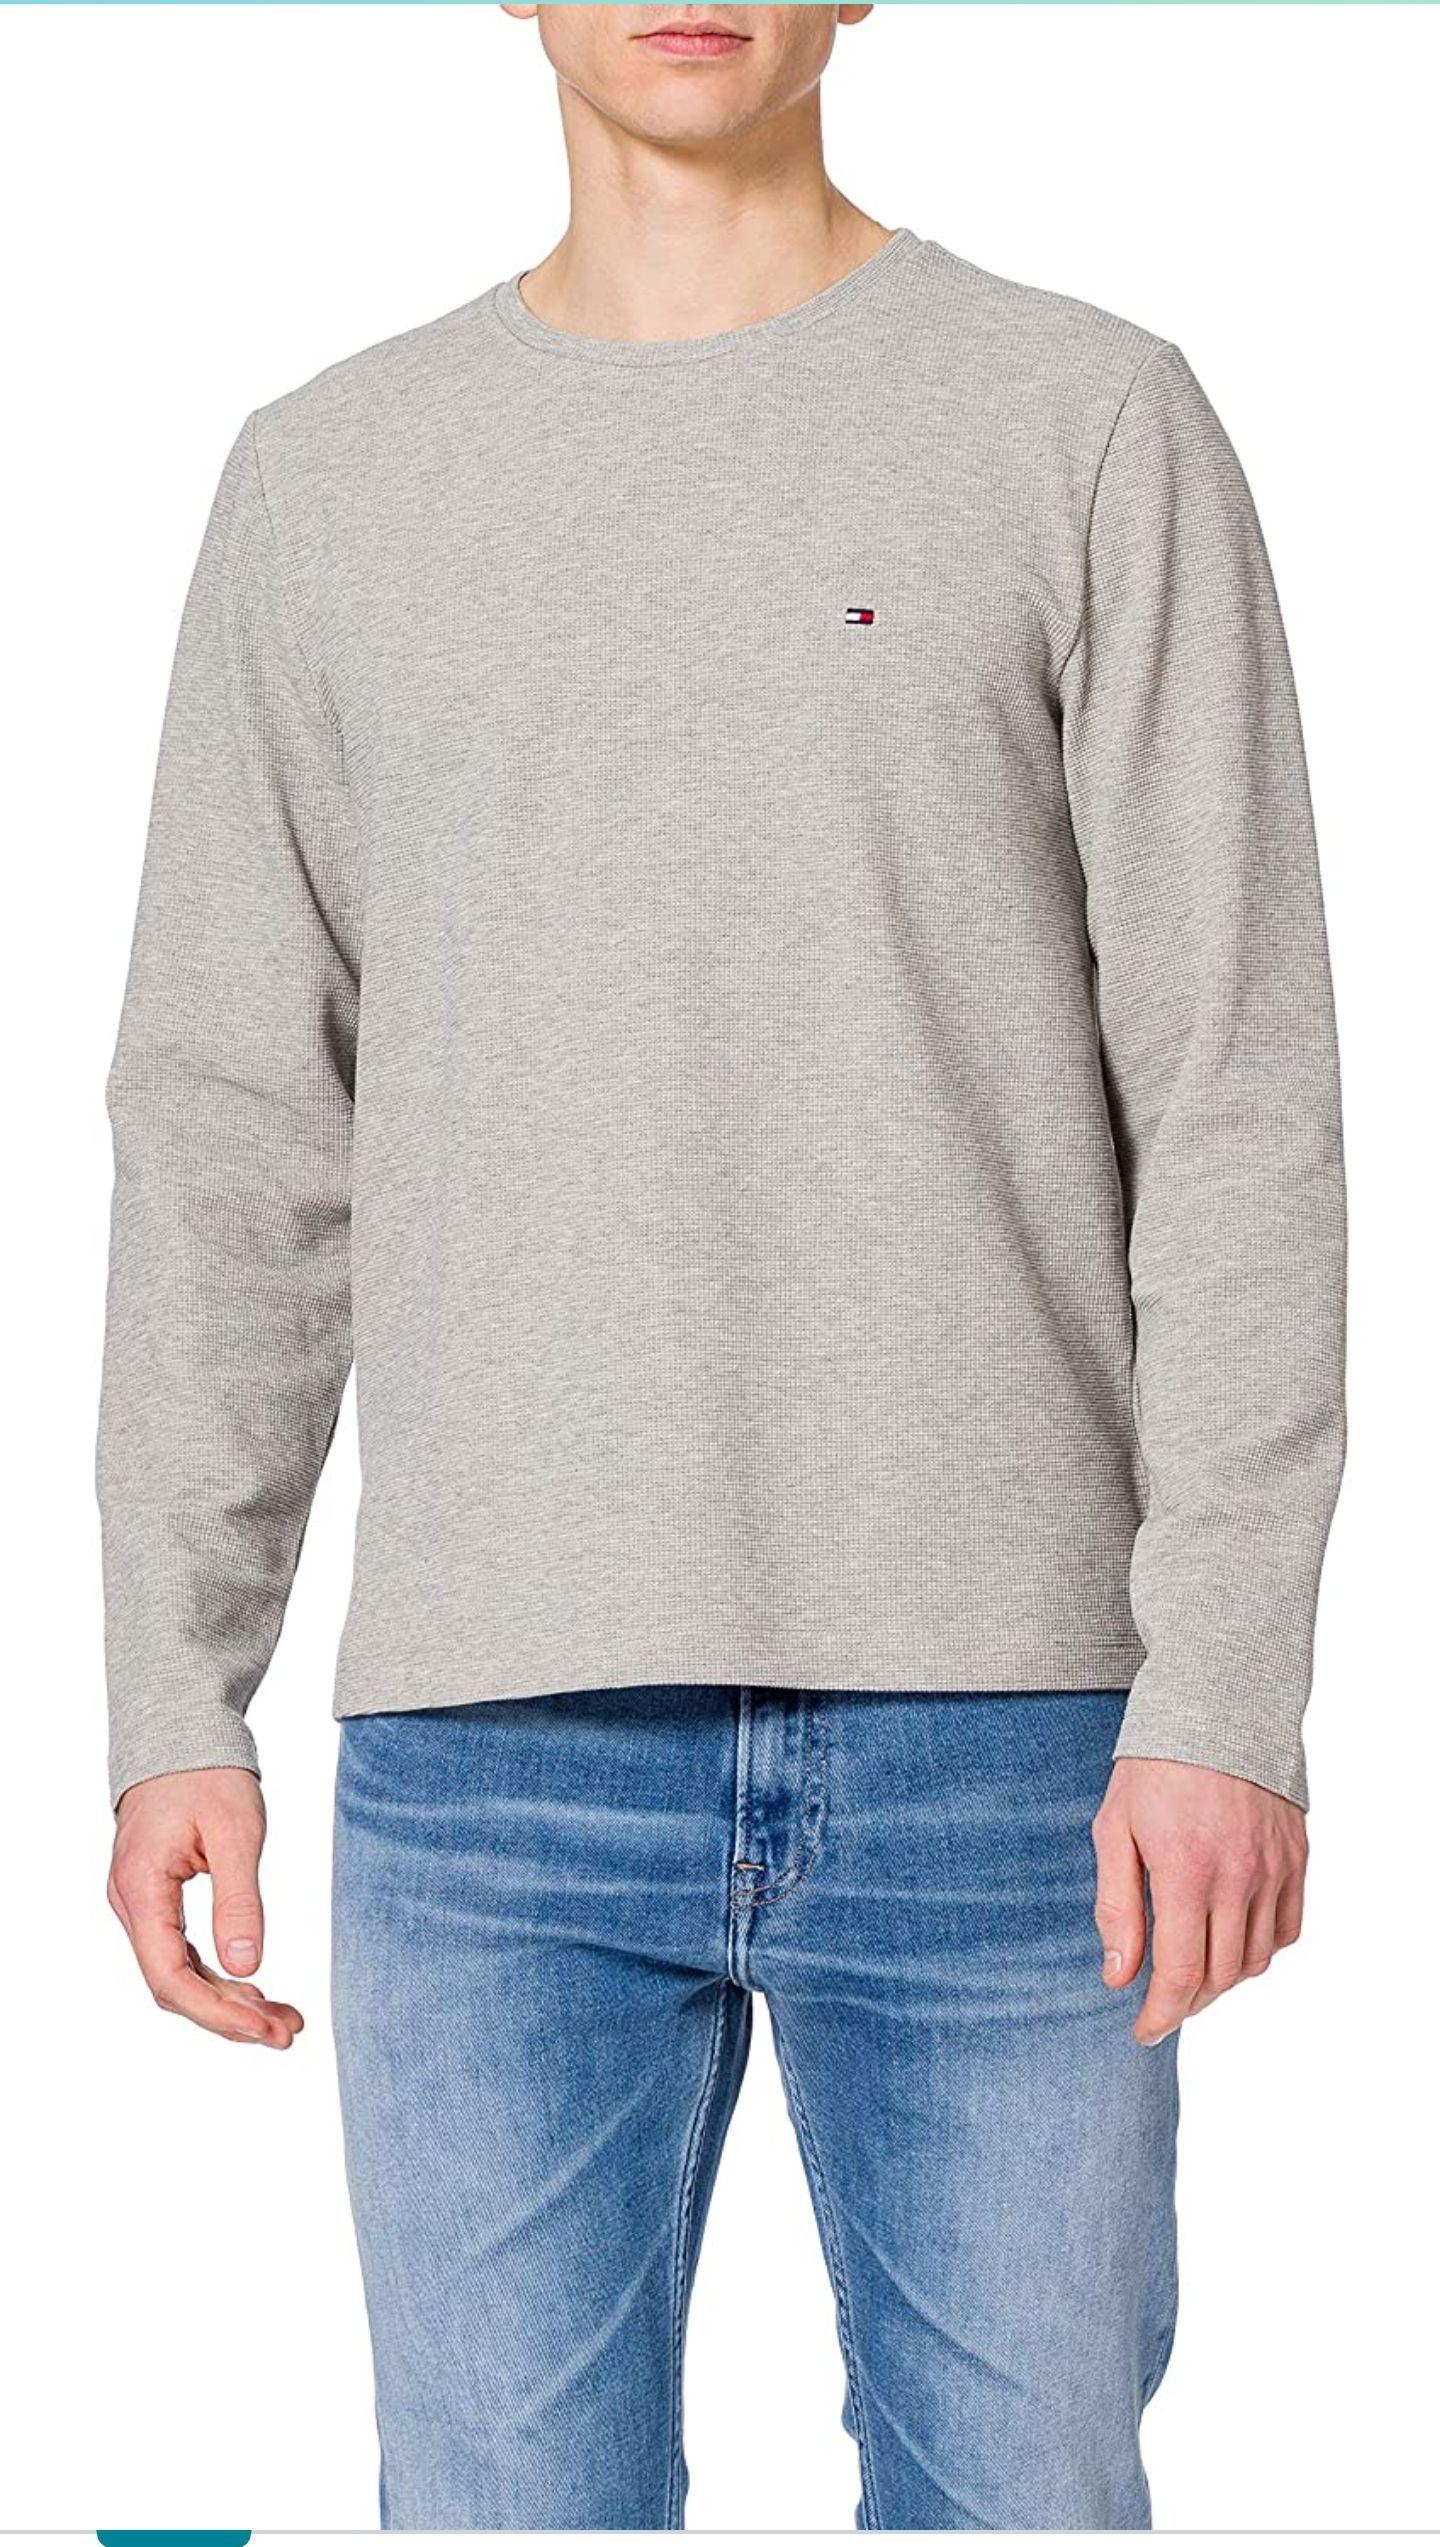 Tommy Hilfiger WAFFLE LONG SLEEVE TEE Men's T-Shirt/Trui